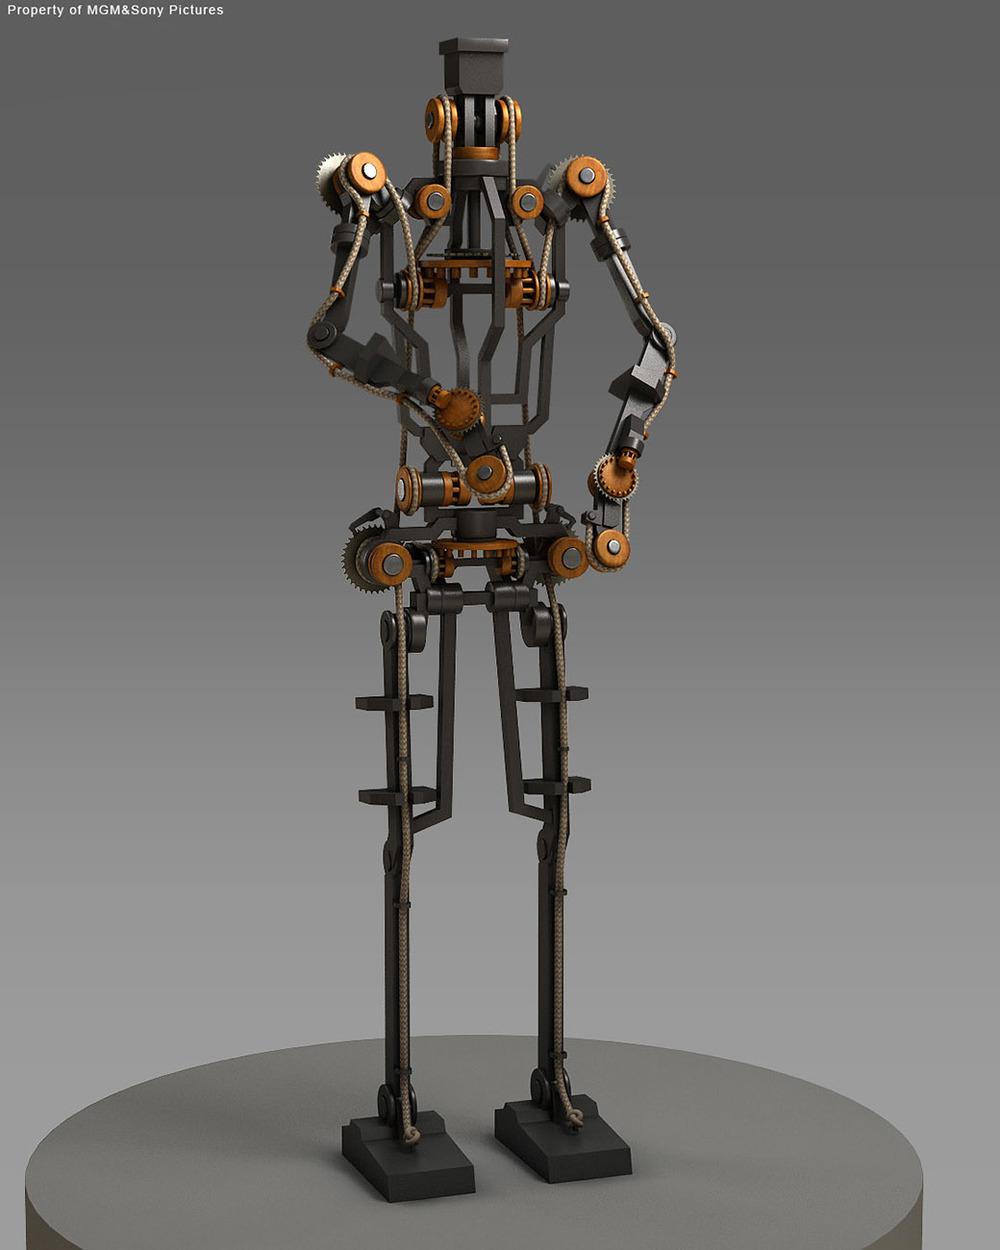 Robocop_Illustration_DaVinciRobot_V01_Adjustments_FDeMartini_020234.jpg